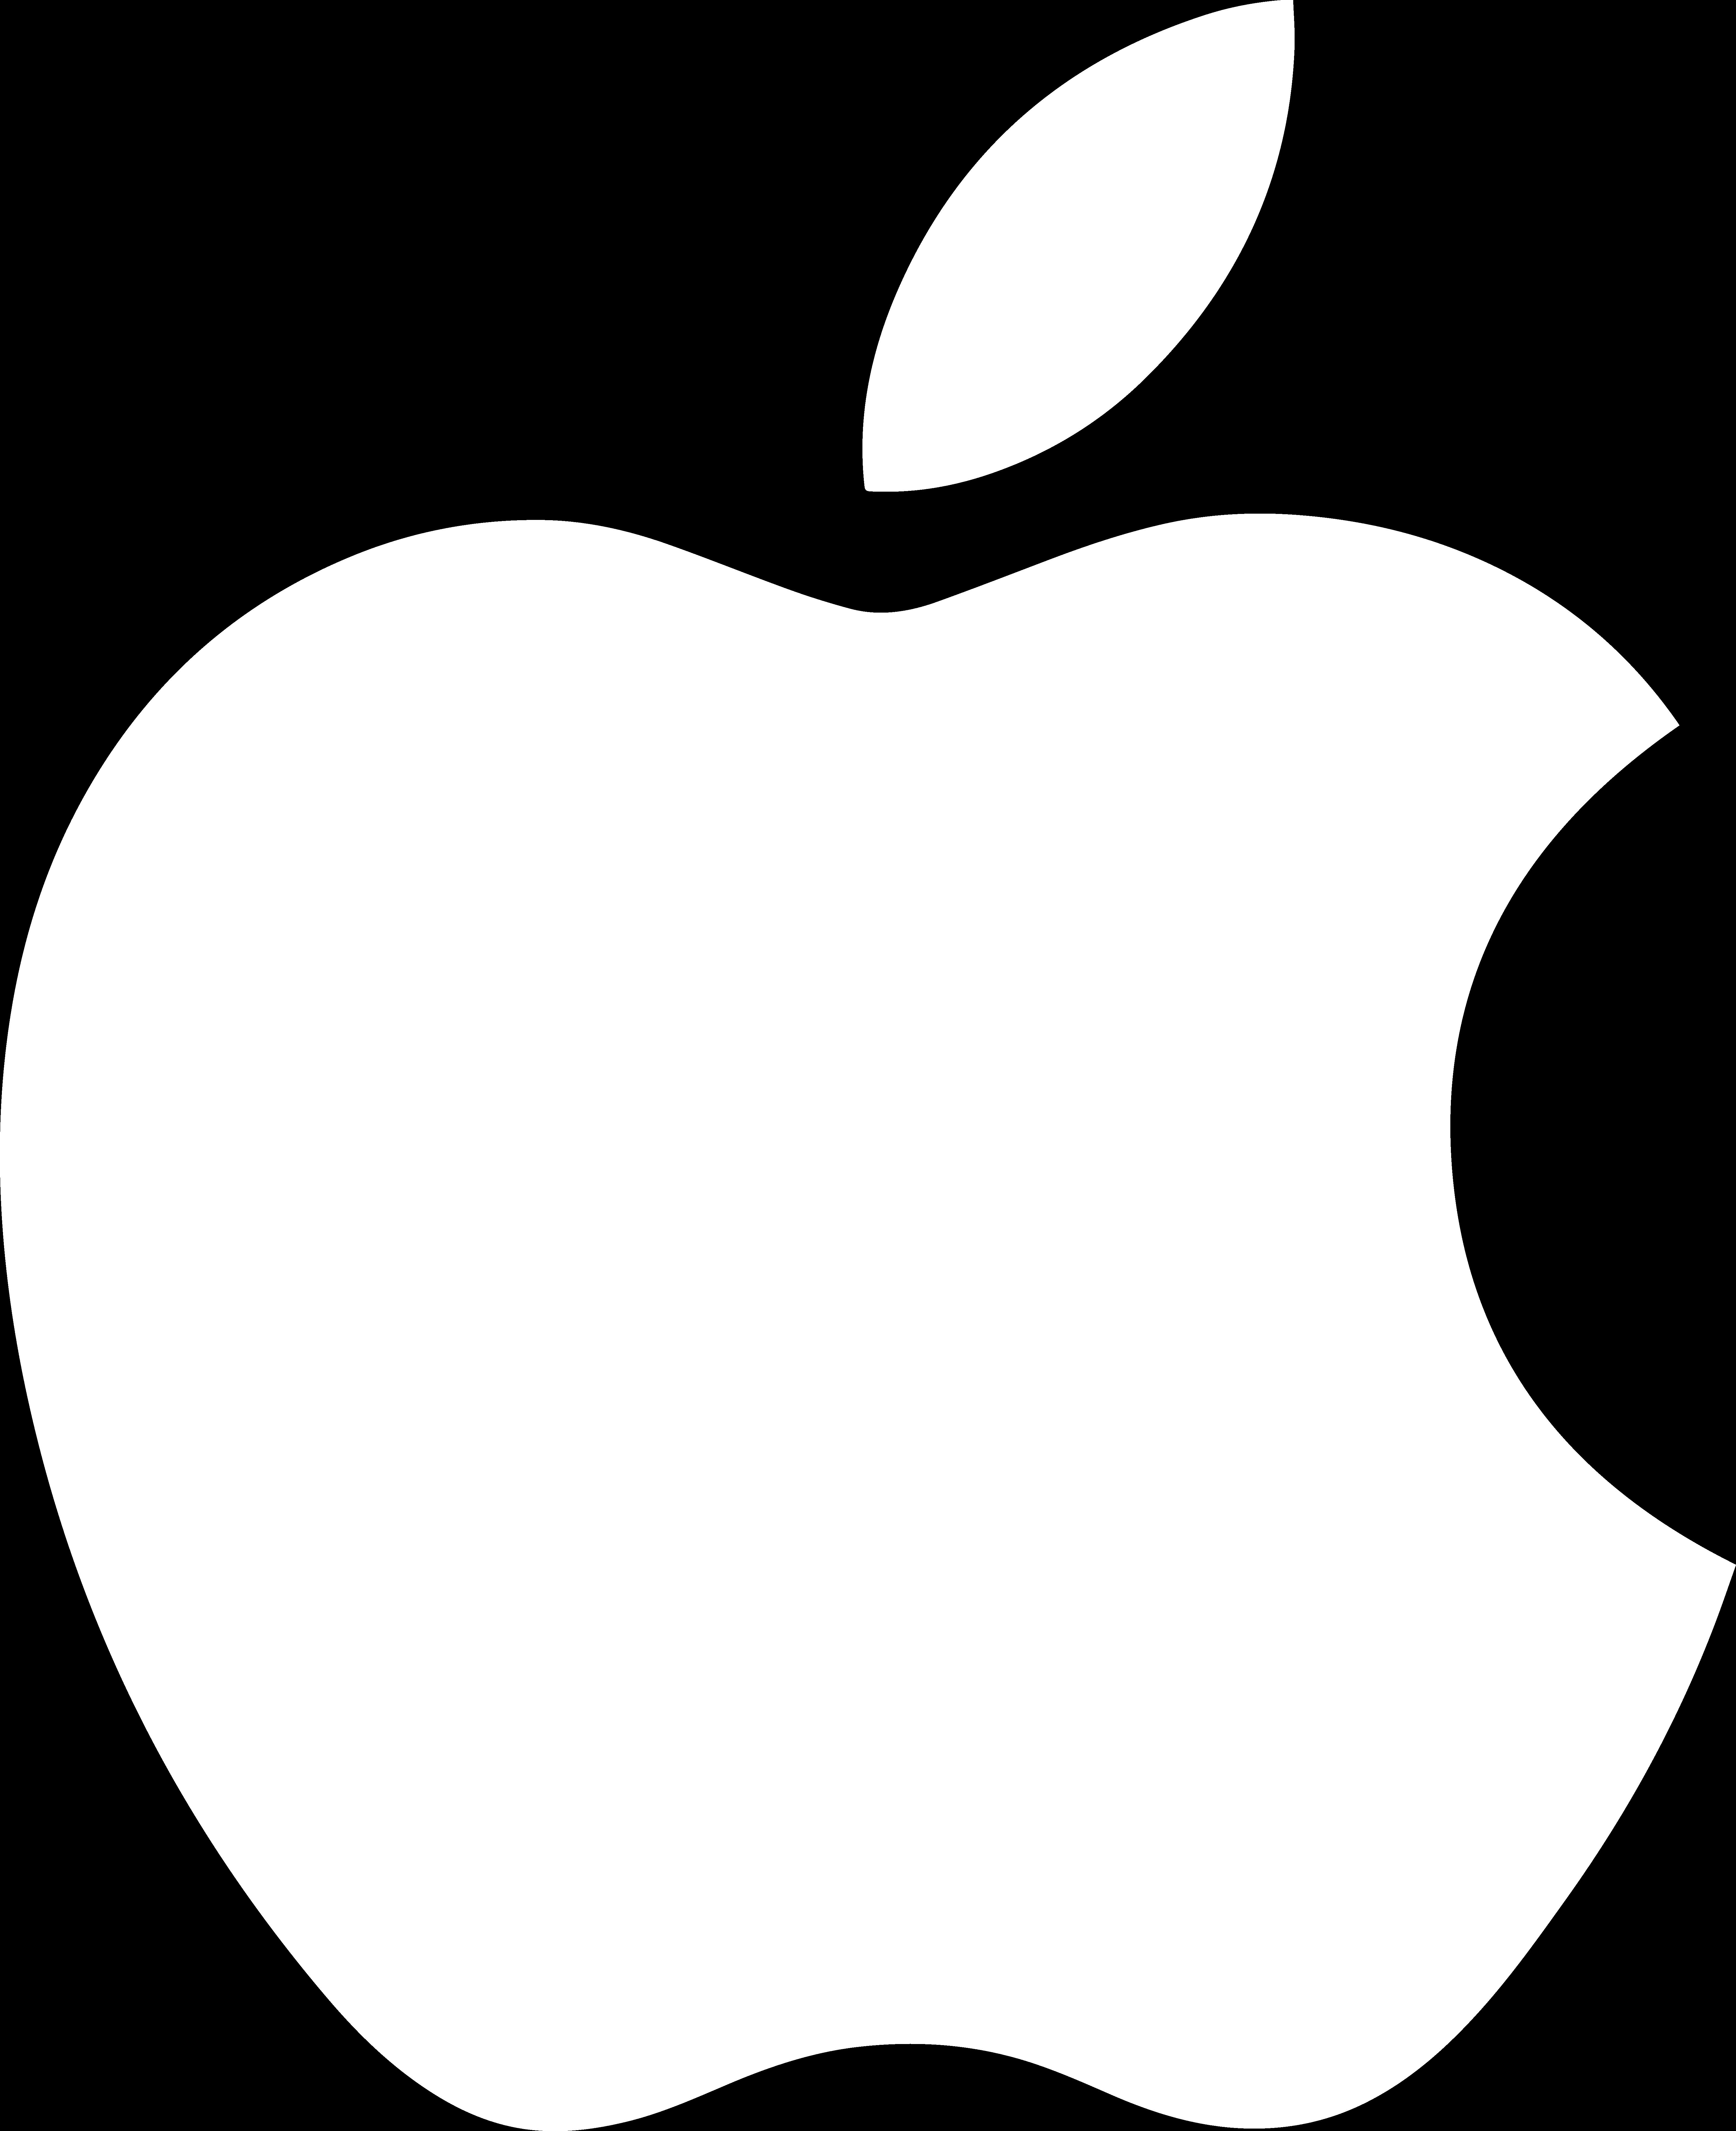 applelogowhite.png